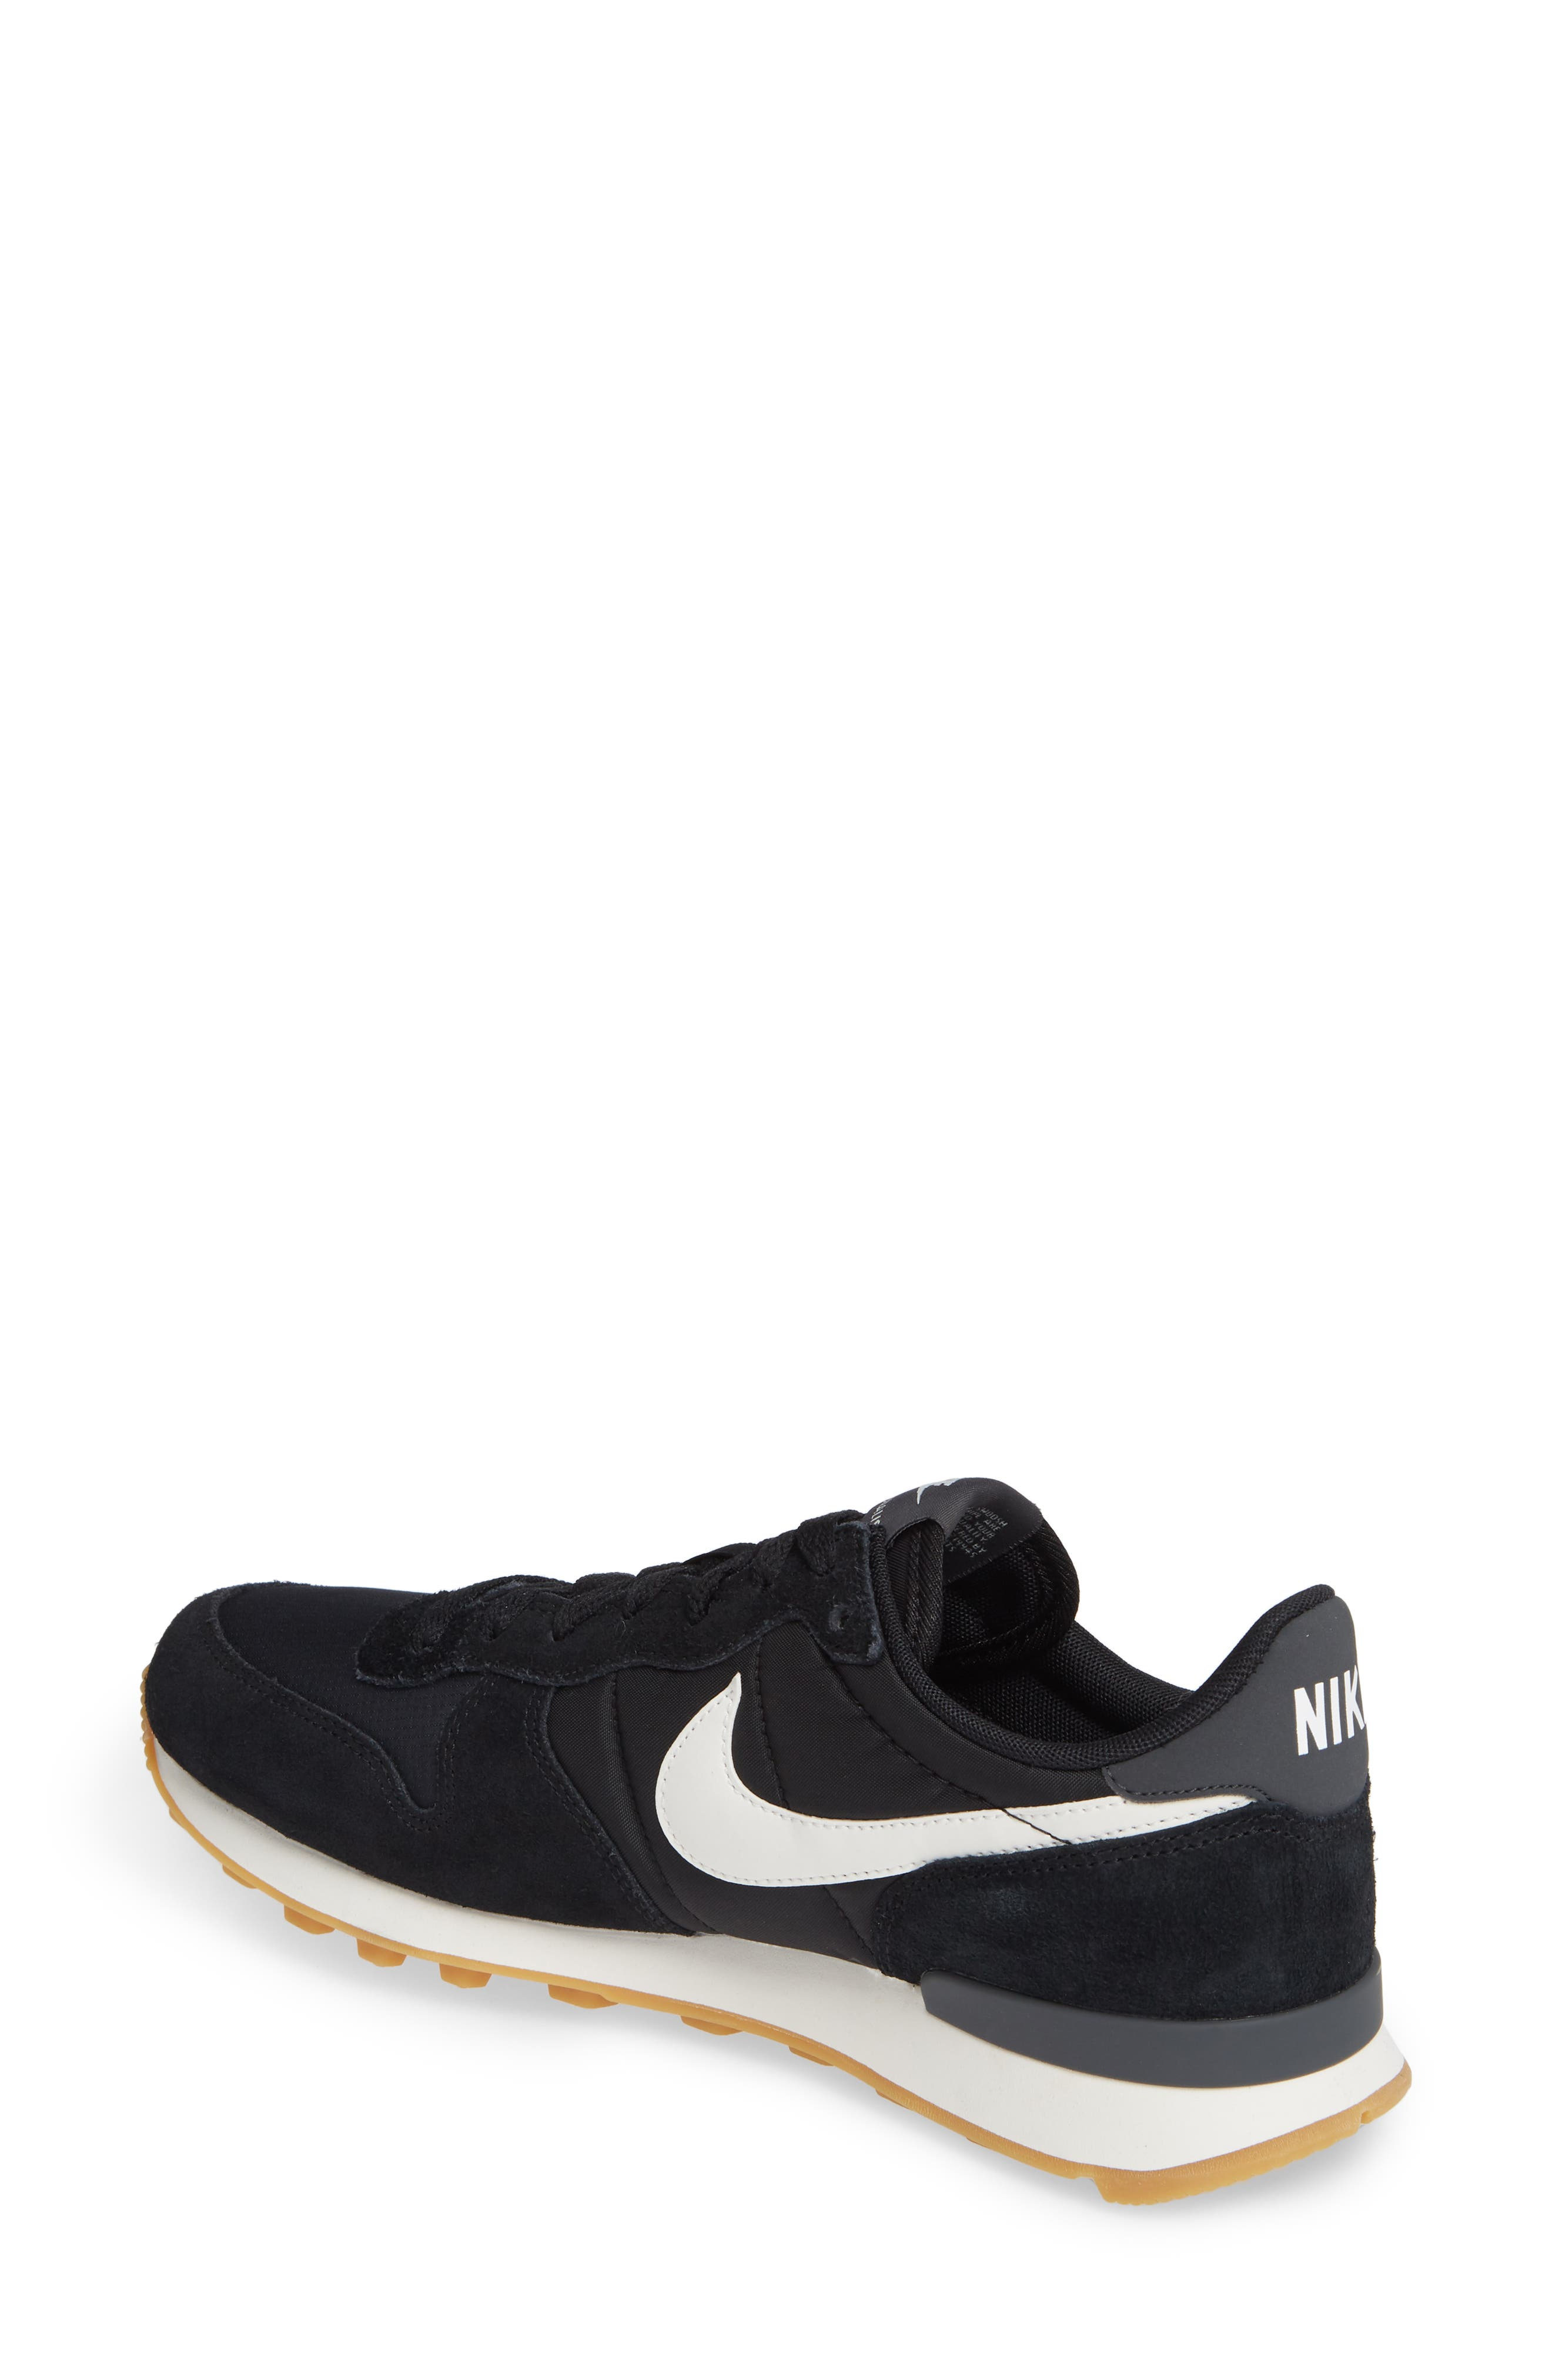 'Internationalist' Sneaker,                             Alternate thumbnail 2, color,                             001